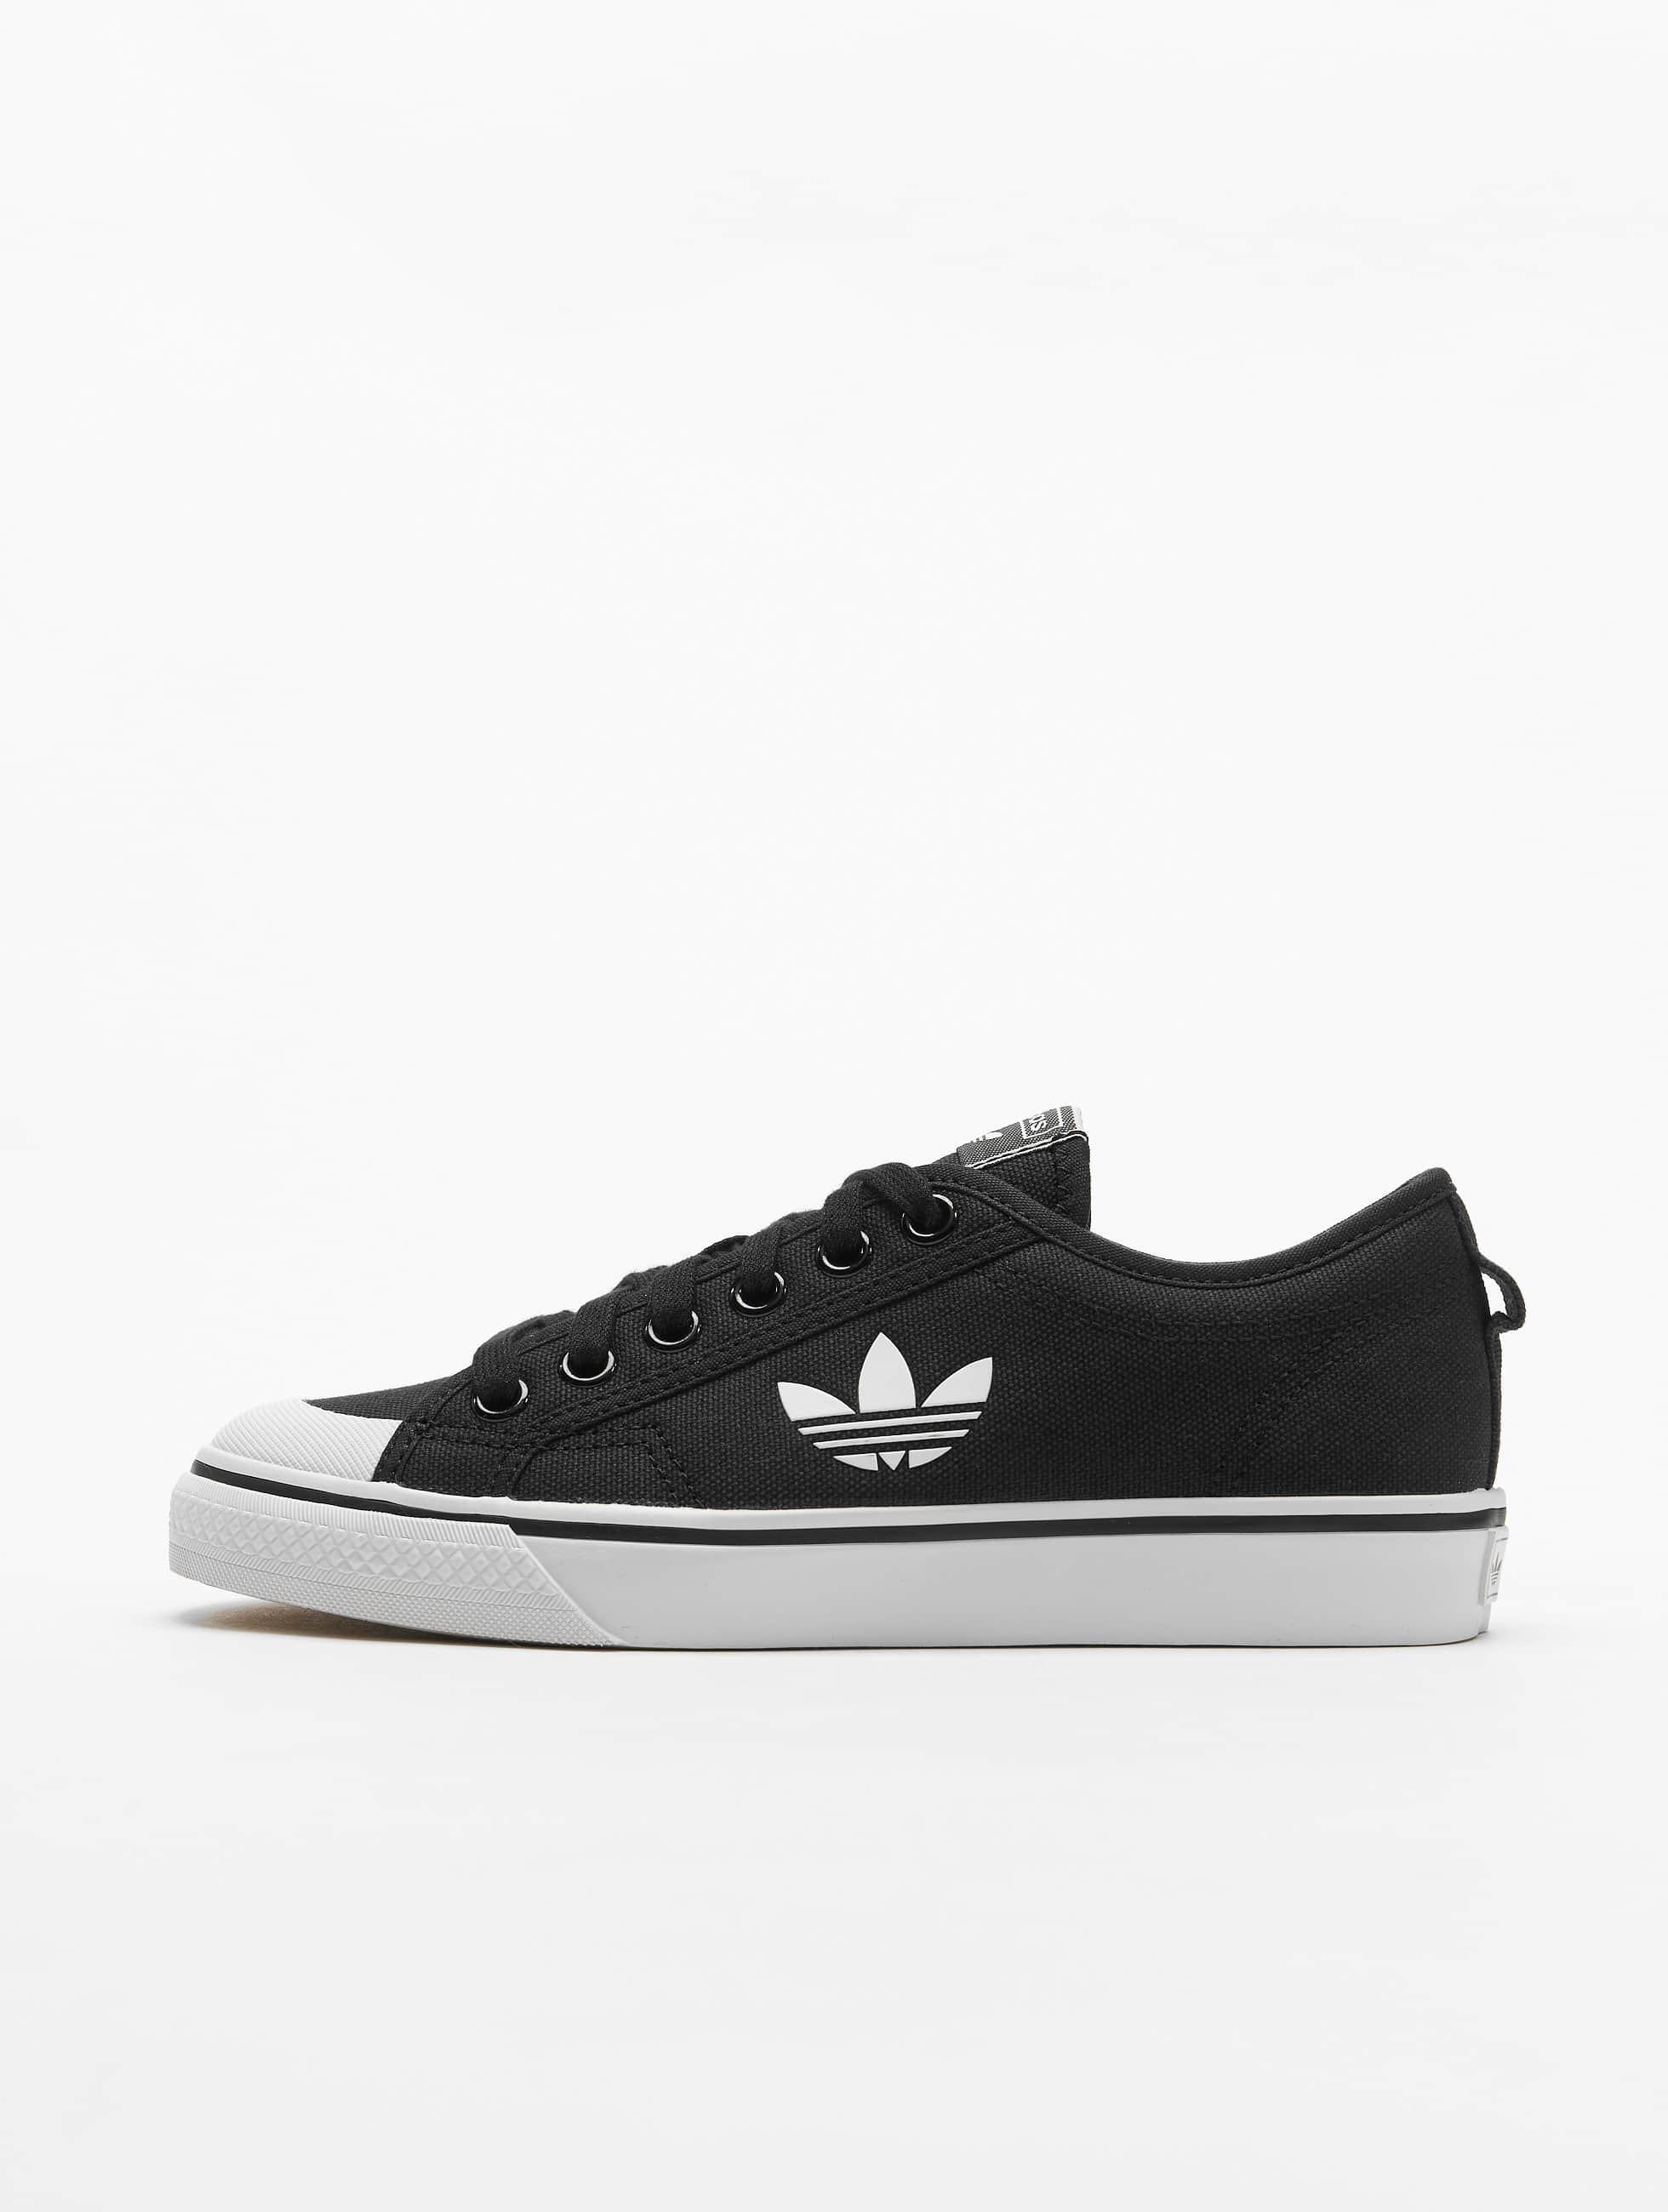 Adidas Nizza Trefoil Sneakers Core Black/Ftwr White/Crystal White